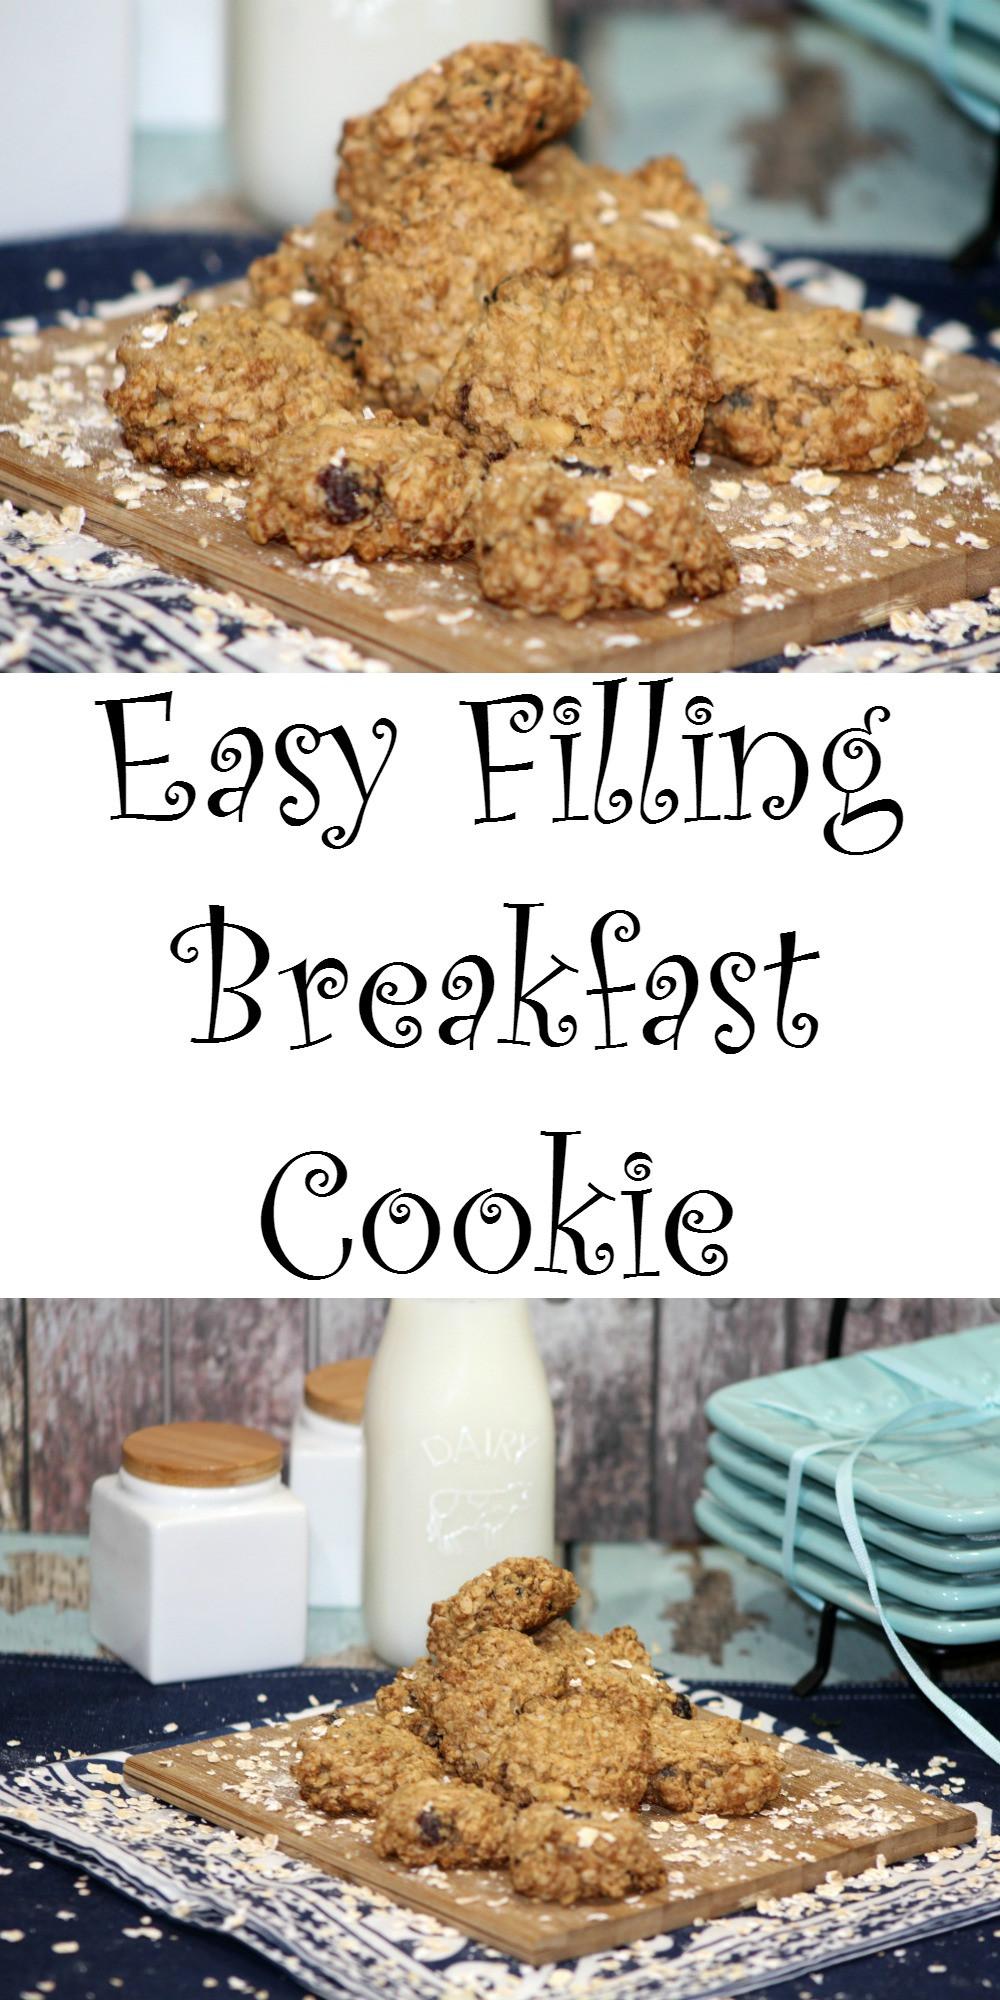 Healthy Breakfast Cookie  Easy Filling Healthy Breakfast Cookie Teaspoon Goodness